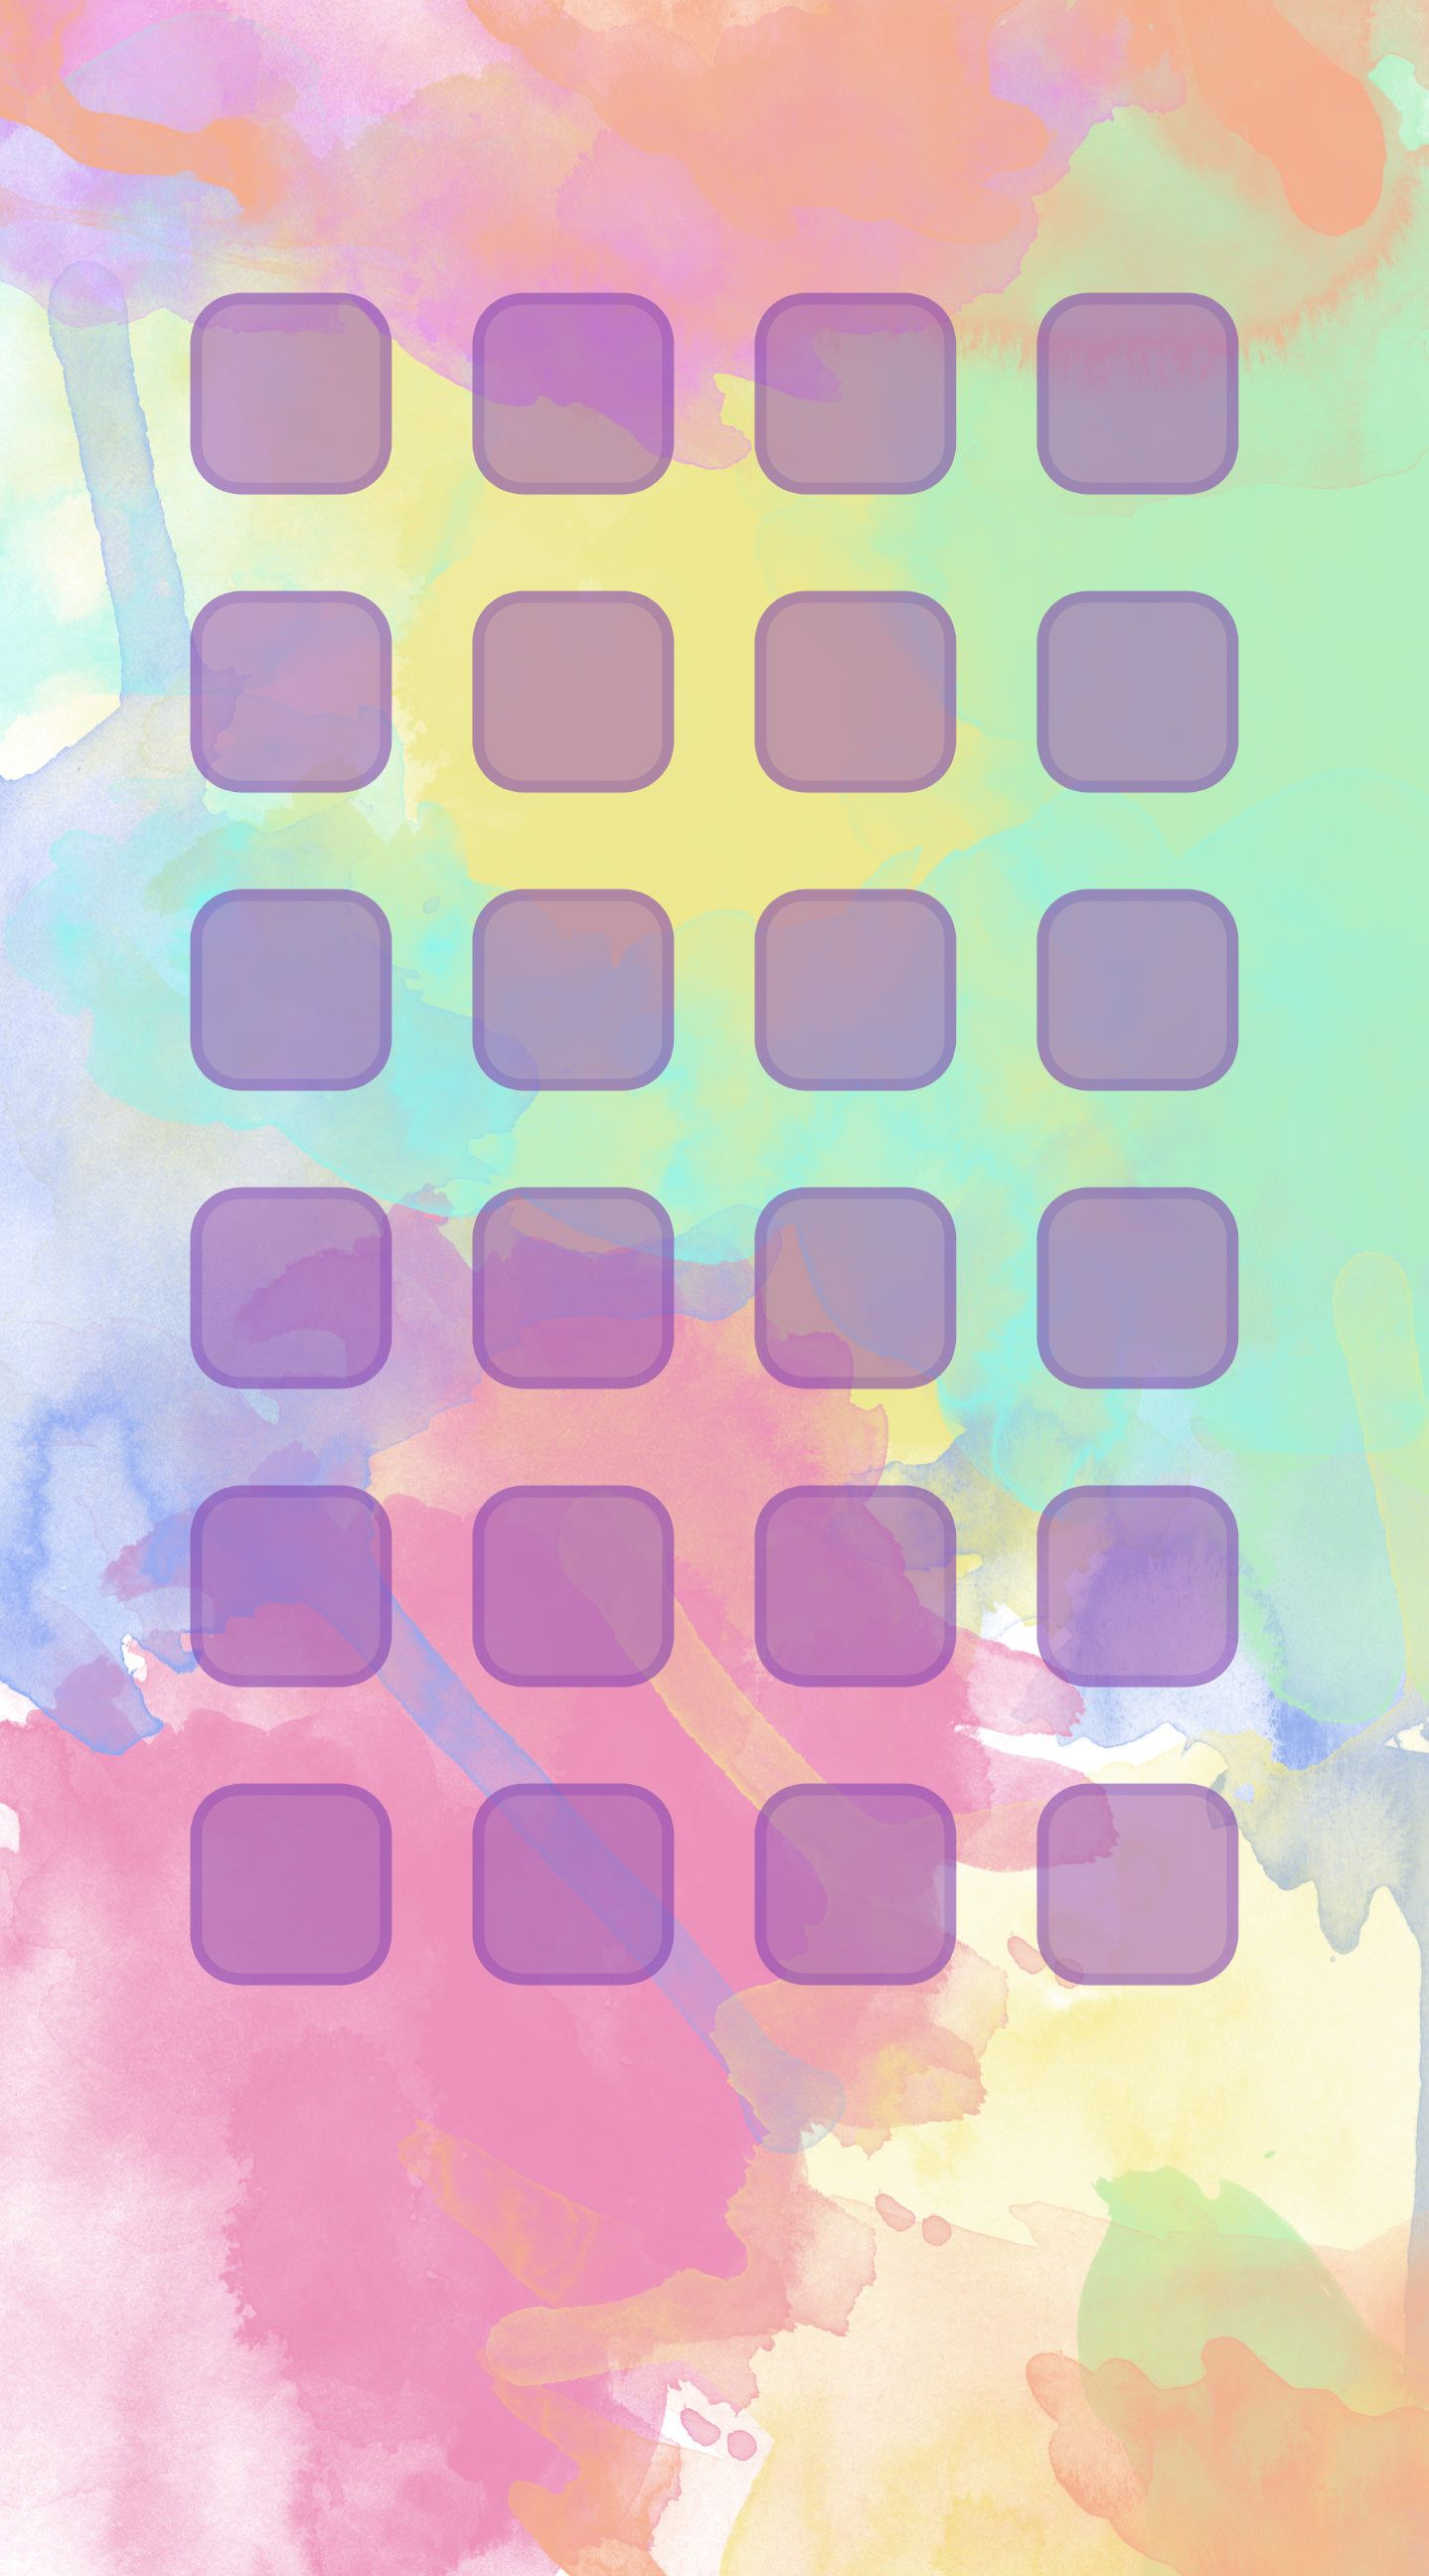 iphone 6 plus wallpaper tumblr Google Search Iphone 6